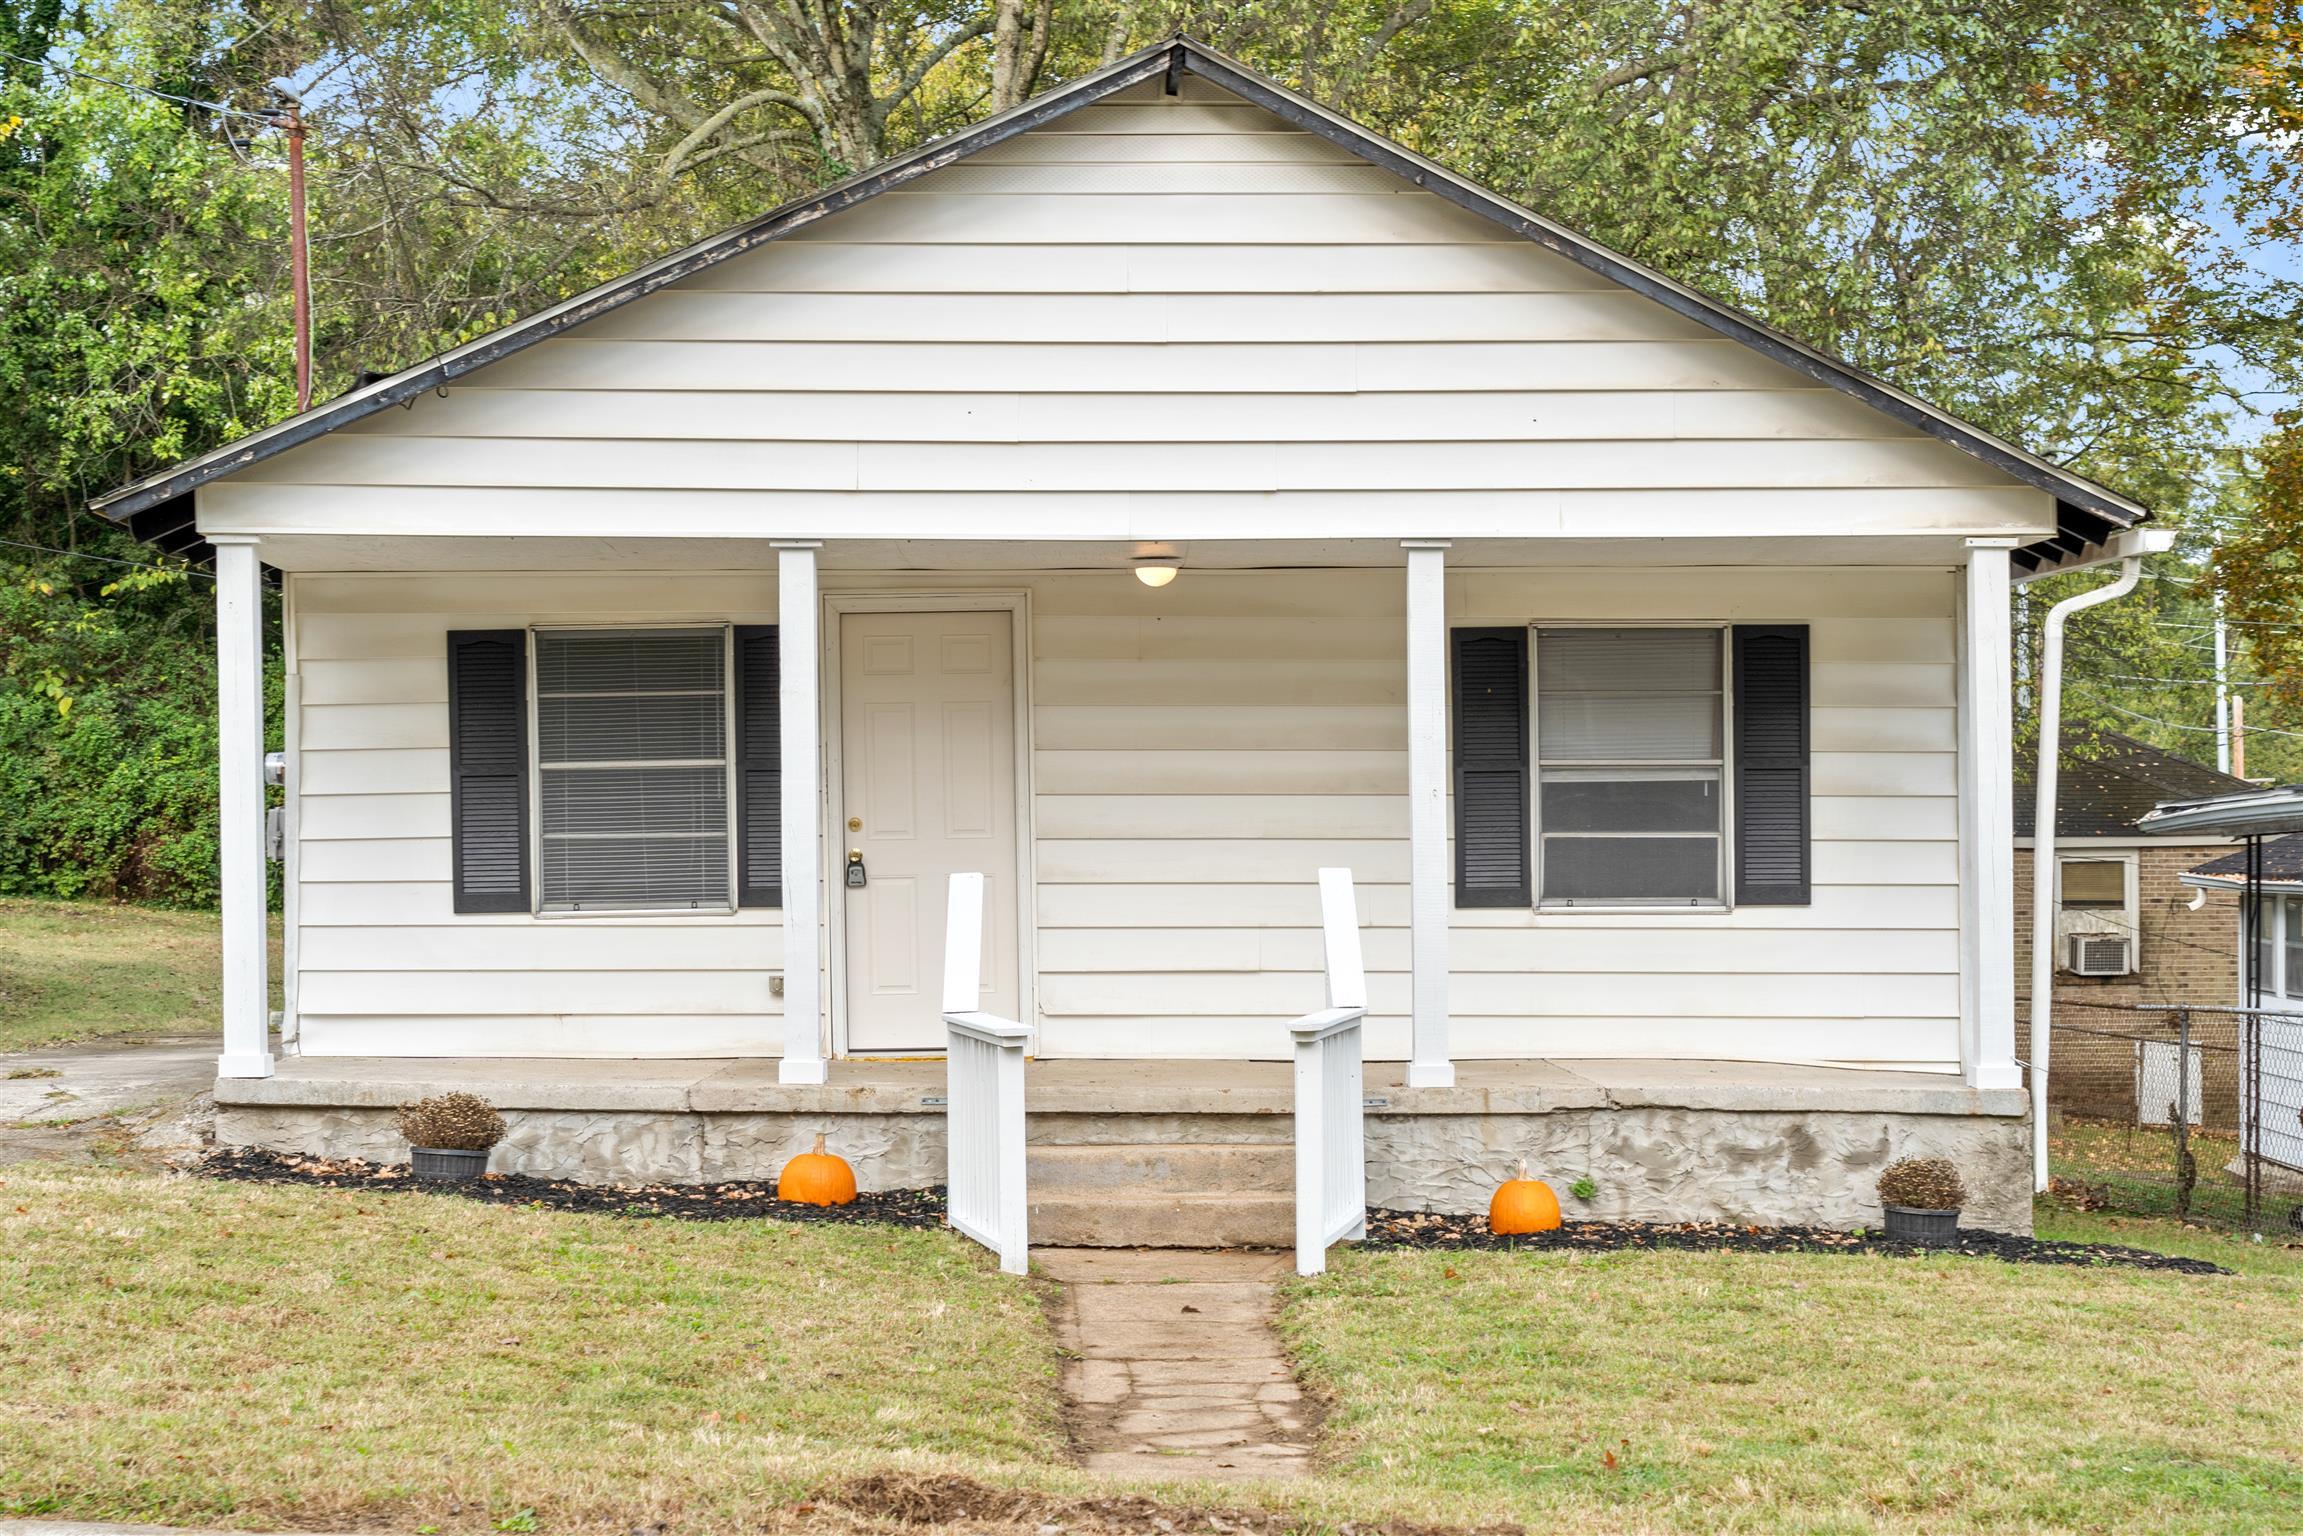 310 Glenn St, Clarksville, TN 37040 - Clarksville, TN real estate listing